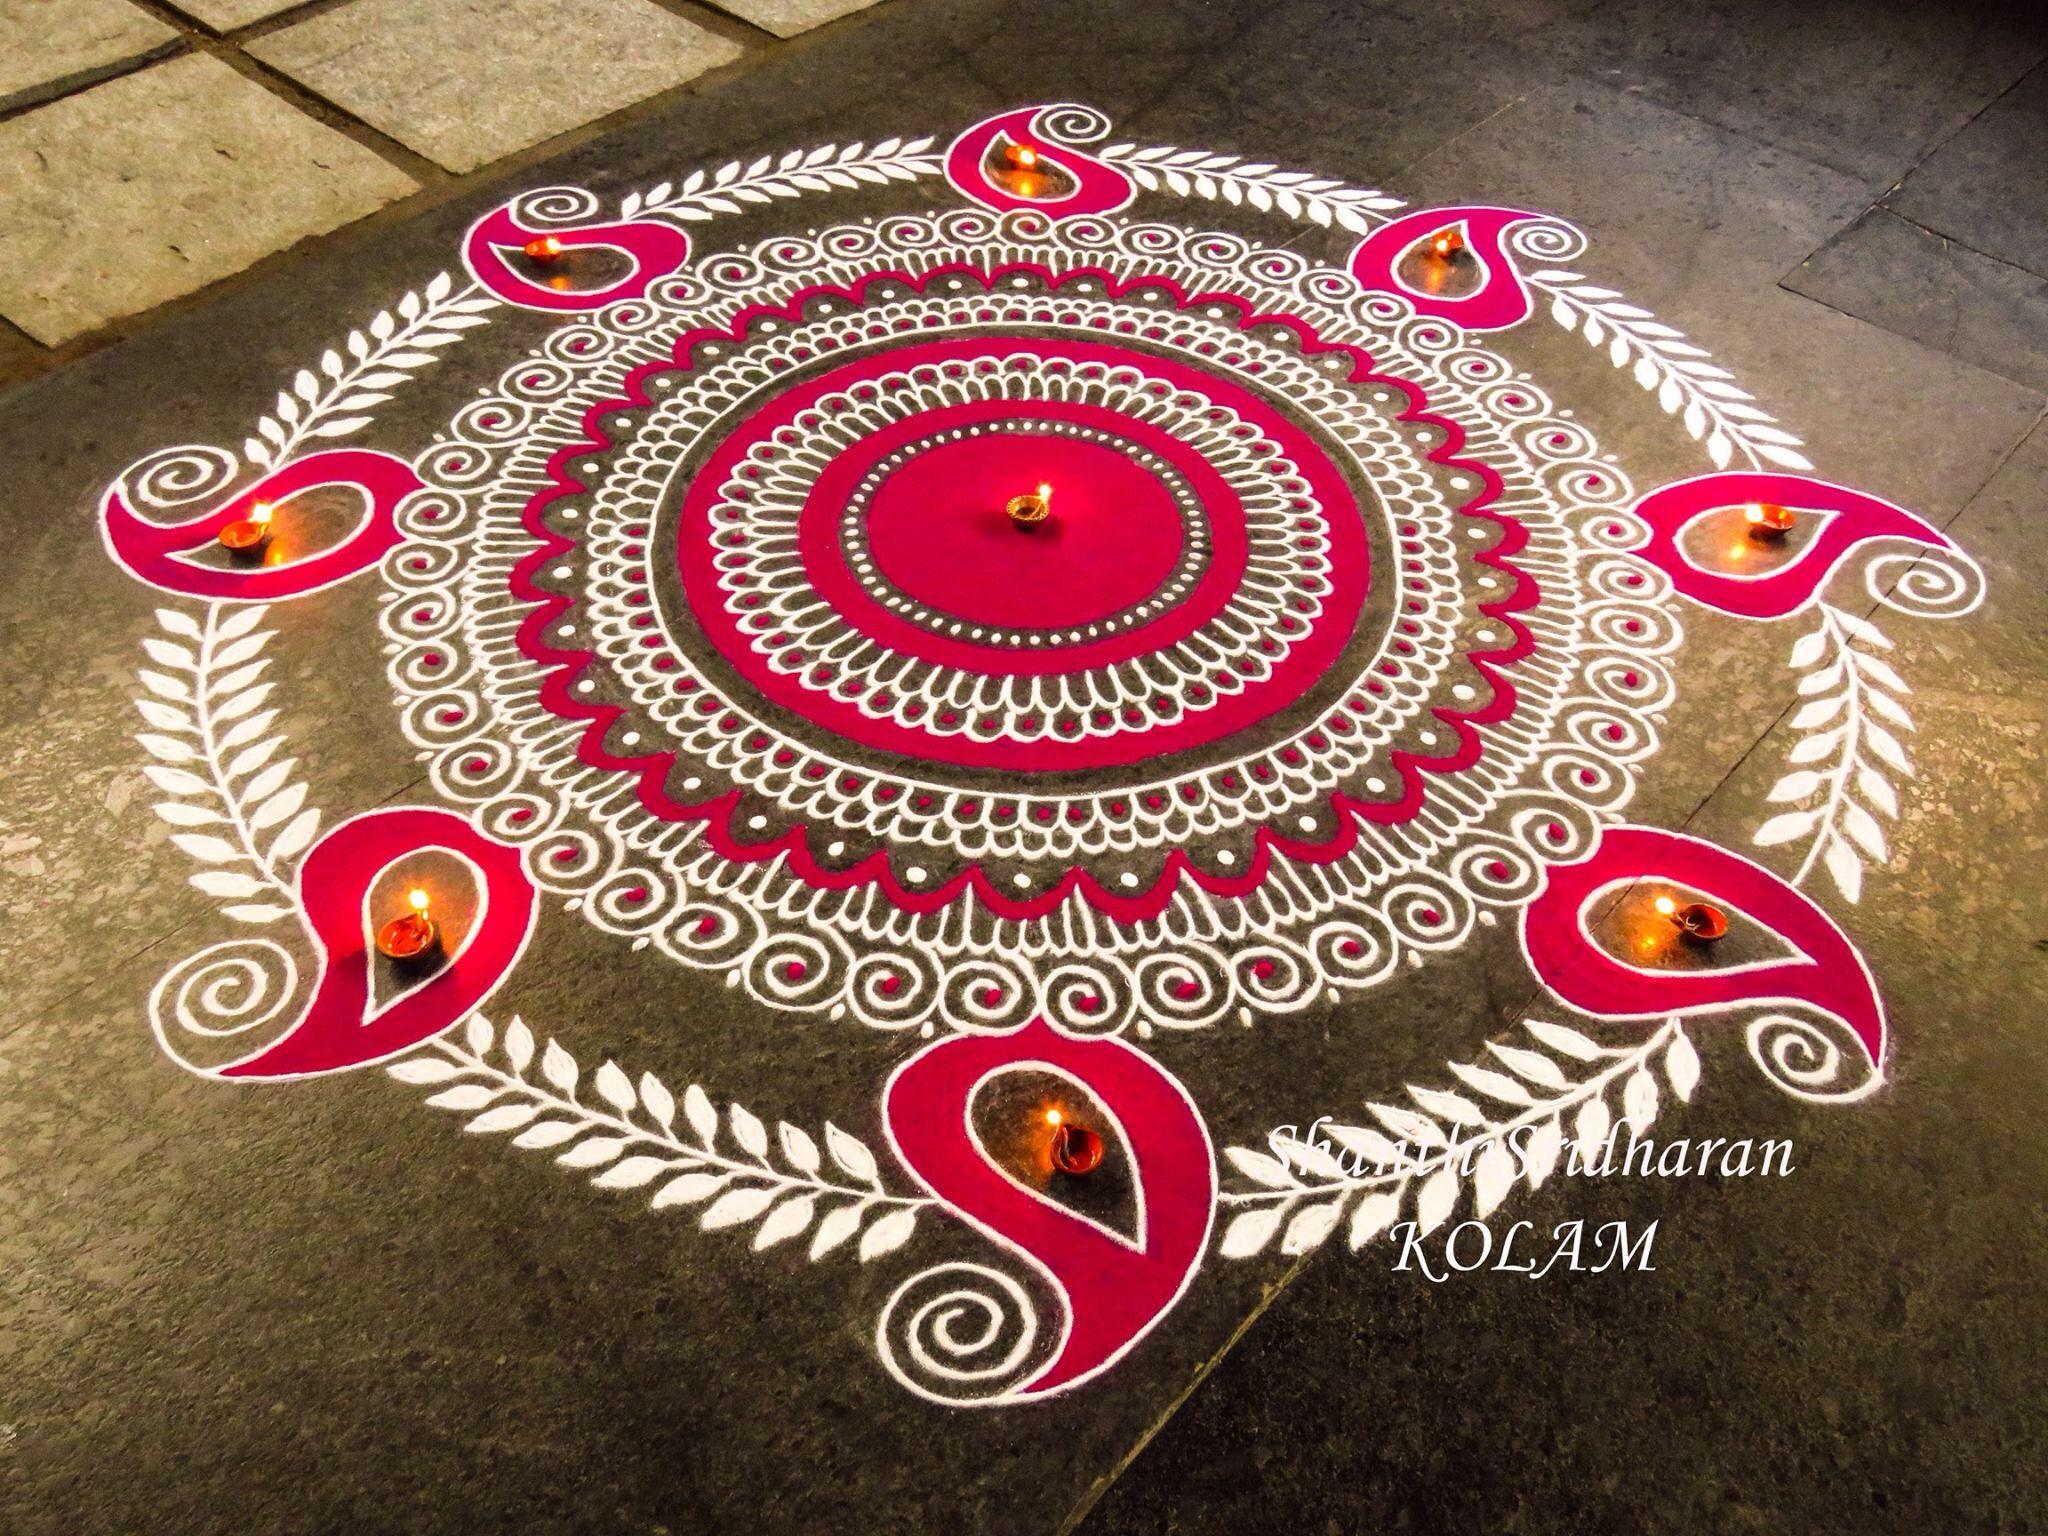 Flower Rangoli Indian Diwali Designs Easy Ideas Patterns Kolam Beautiful